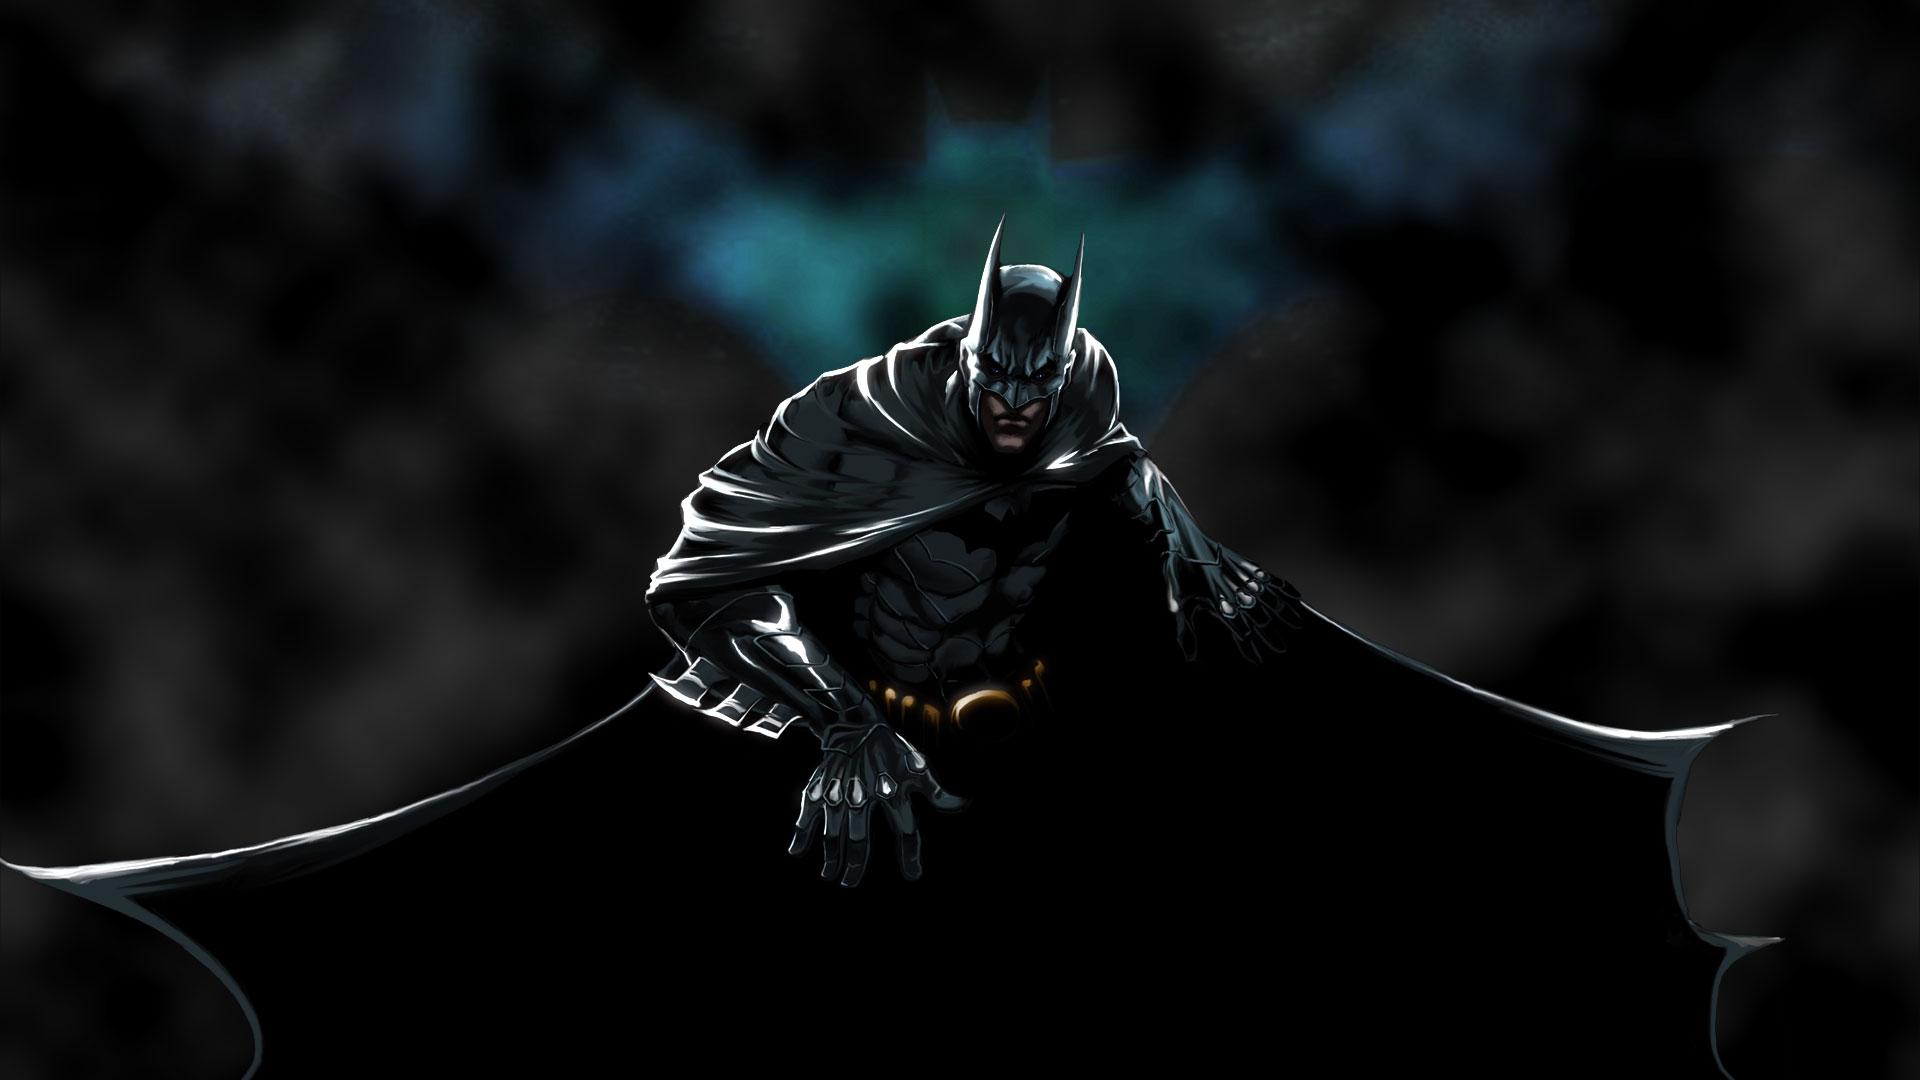 batman computer wallpapers desktop backgrounds